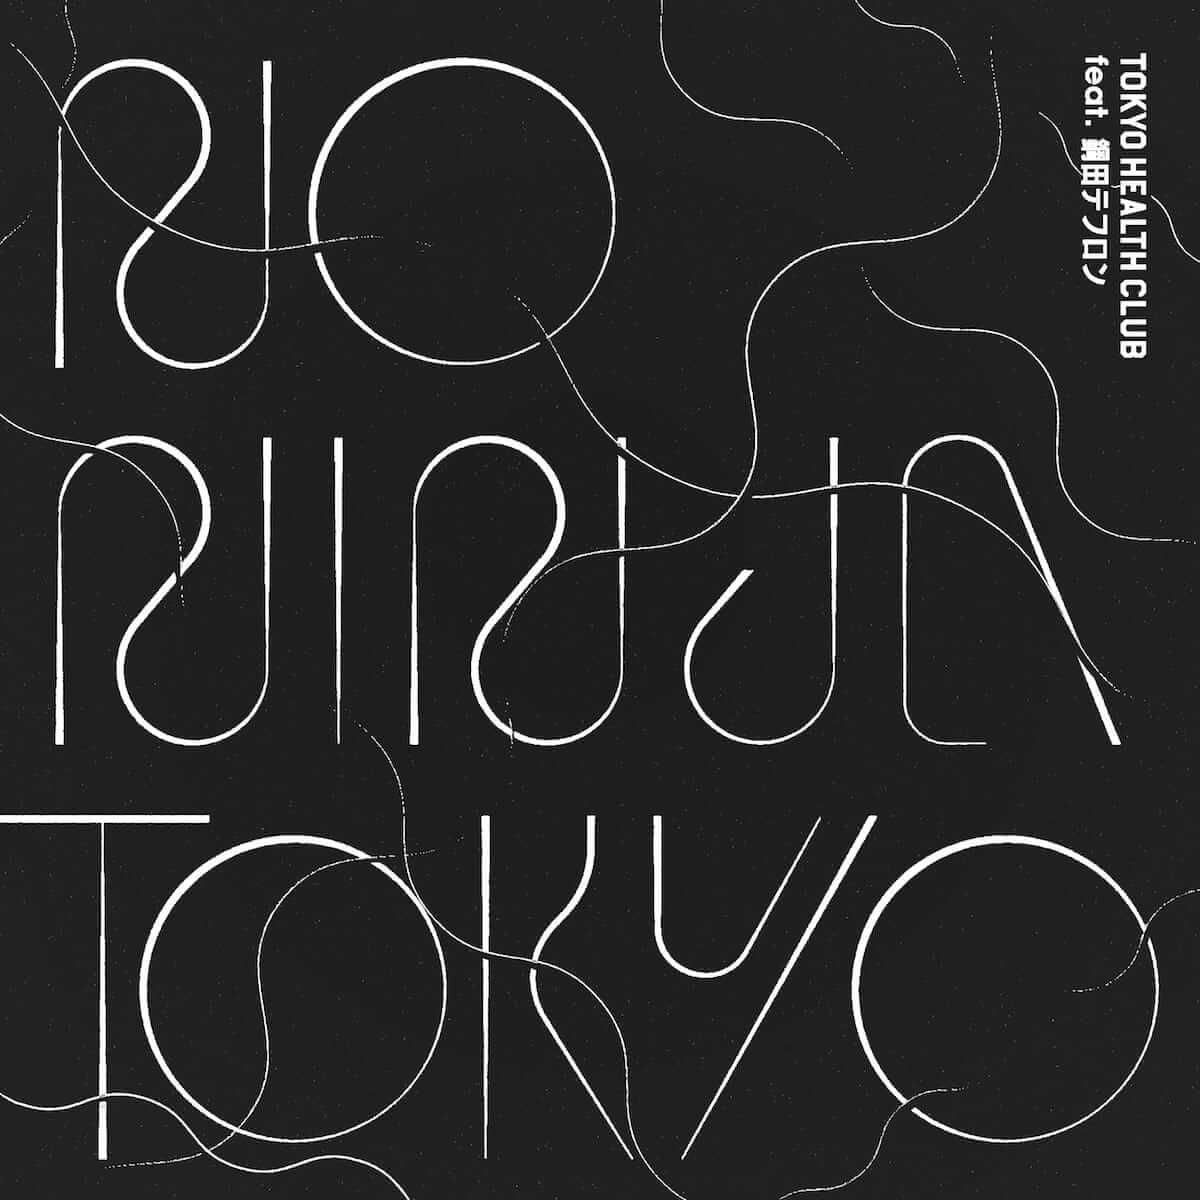 TOKYO HEALTH CLUBの新曲「NO NINJA TOKYO feat. 鋼田テフロン」MVが公開|監督はSpikey John music180702_tokyohealthclub_3-1200x1200